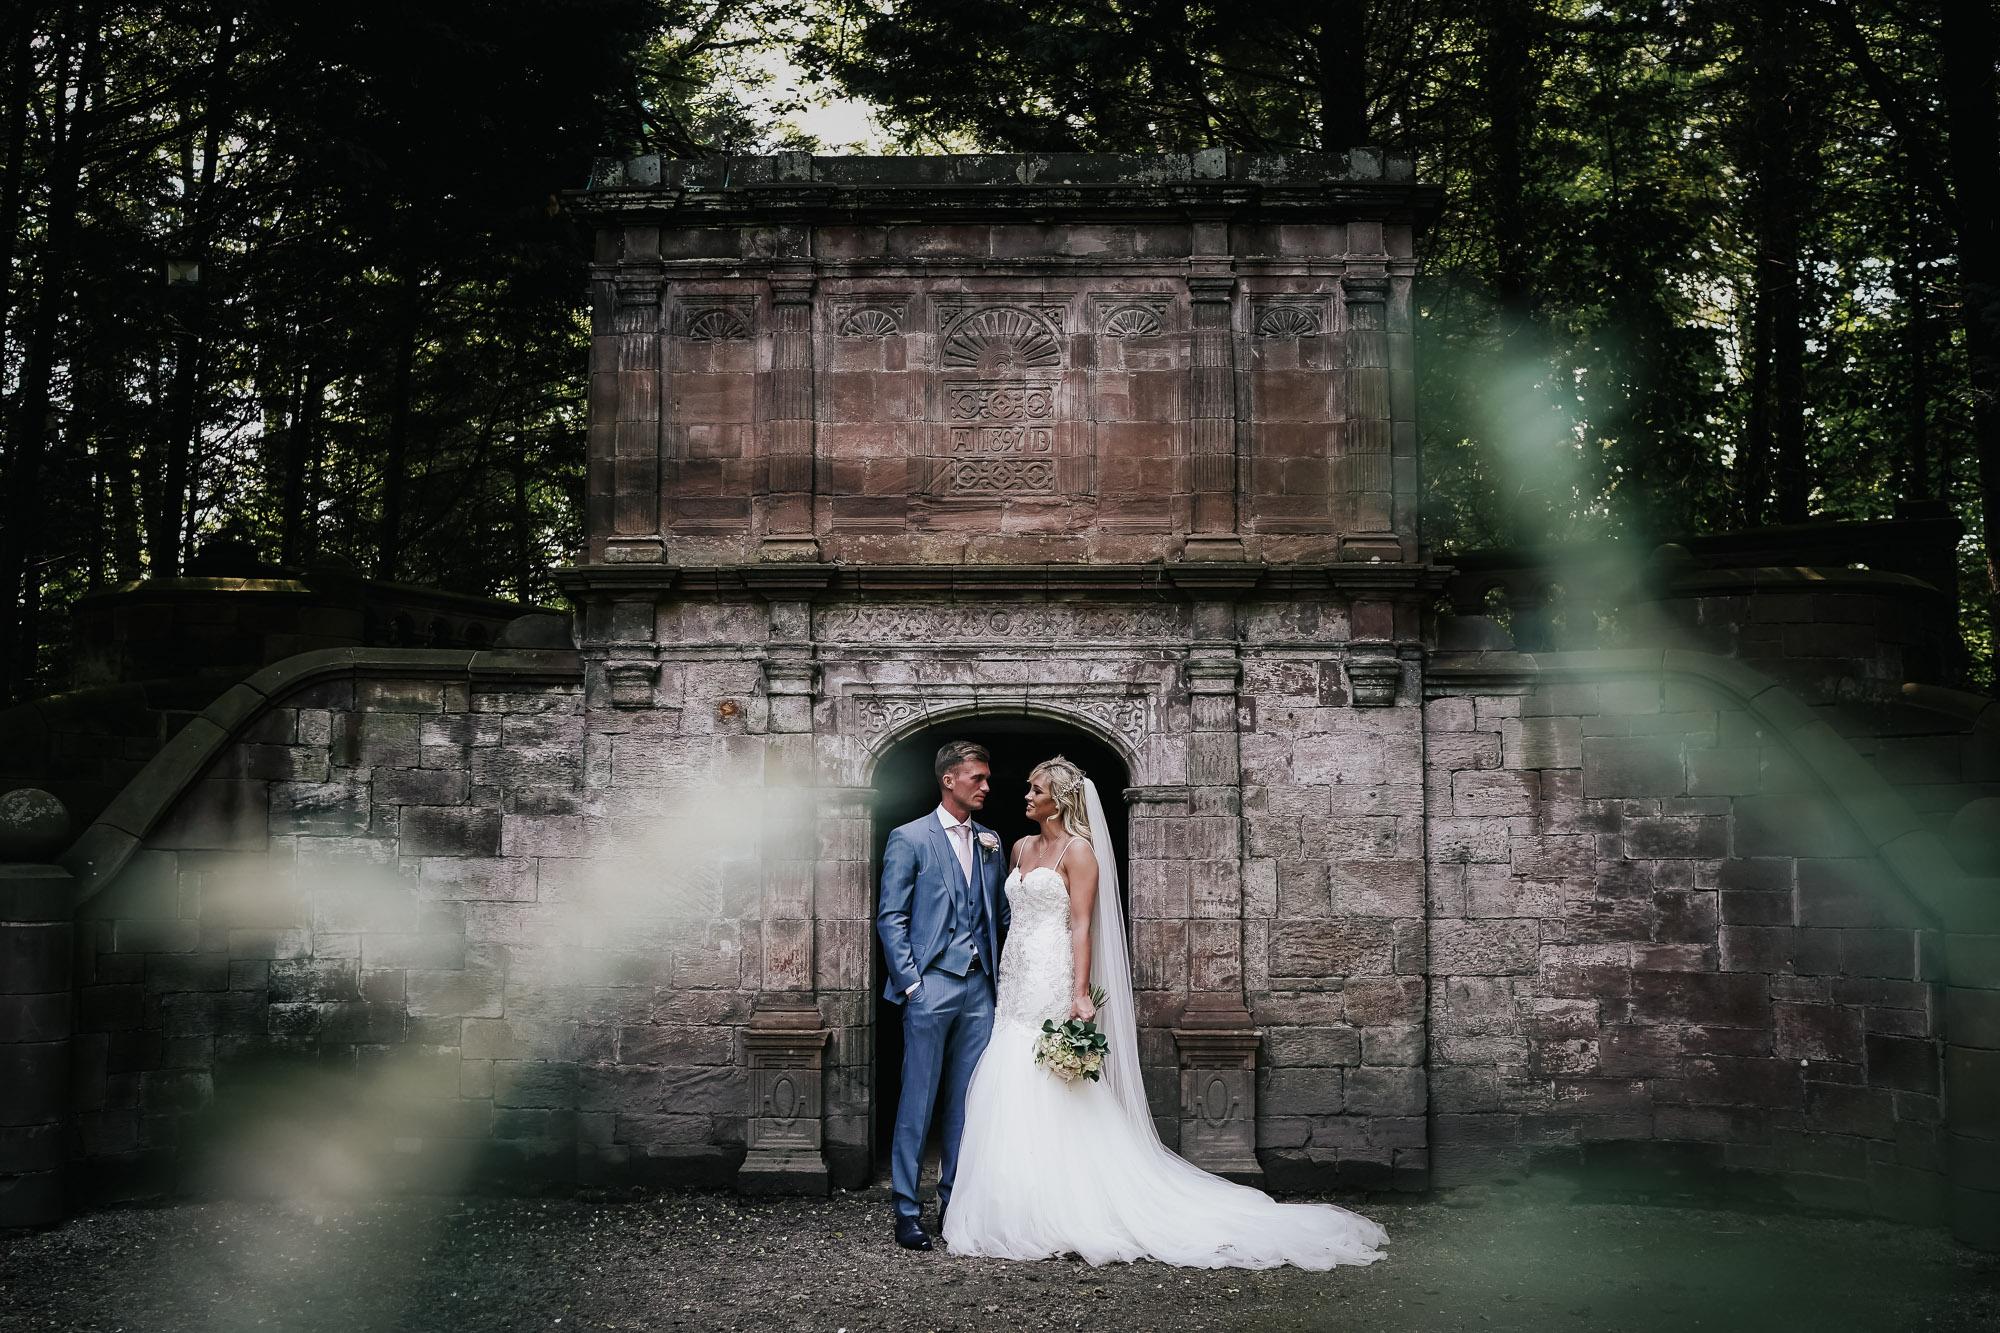 Thornton Manor Lakeside Marquee Wedding Photographer  (35 of 53).jpg